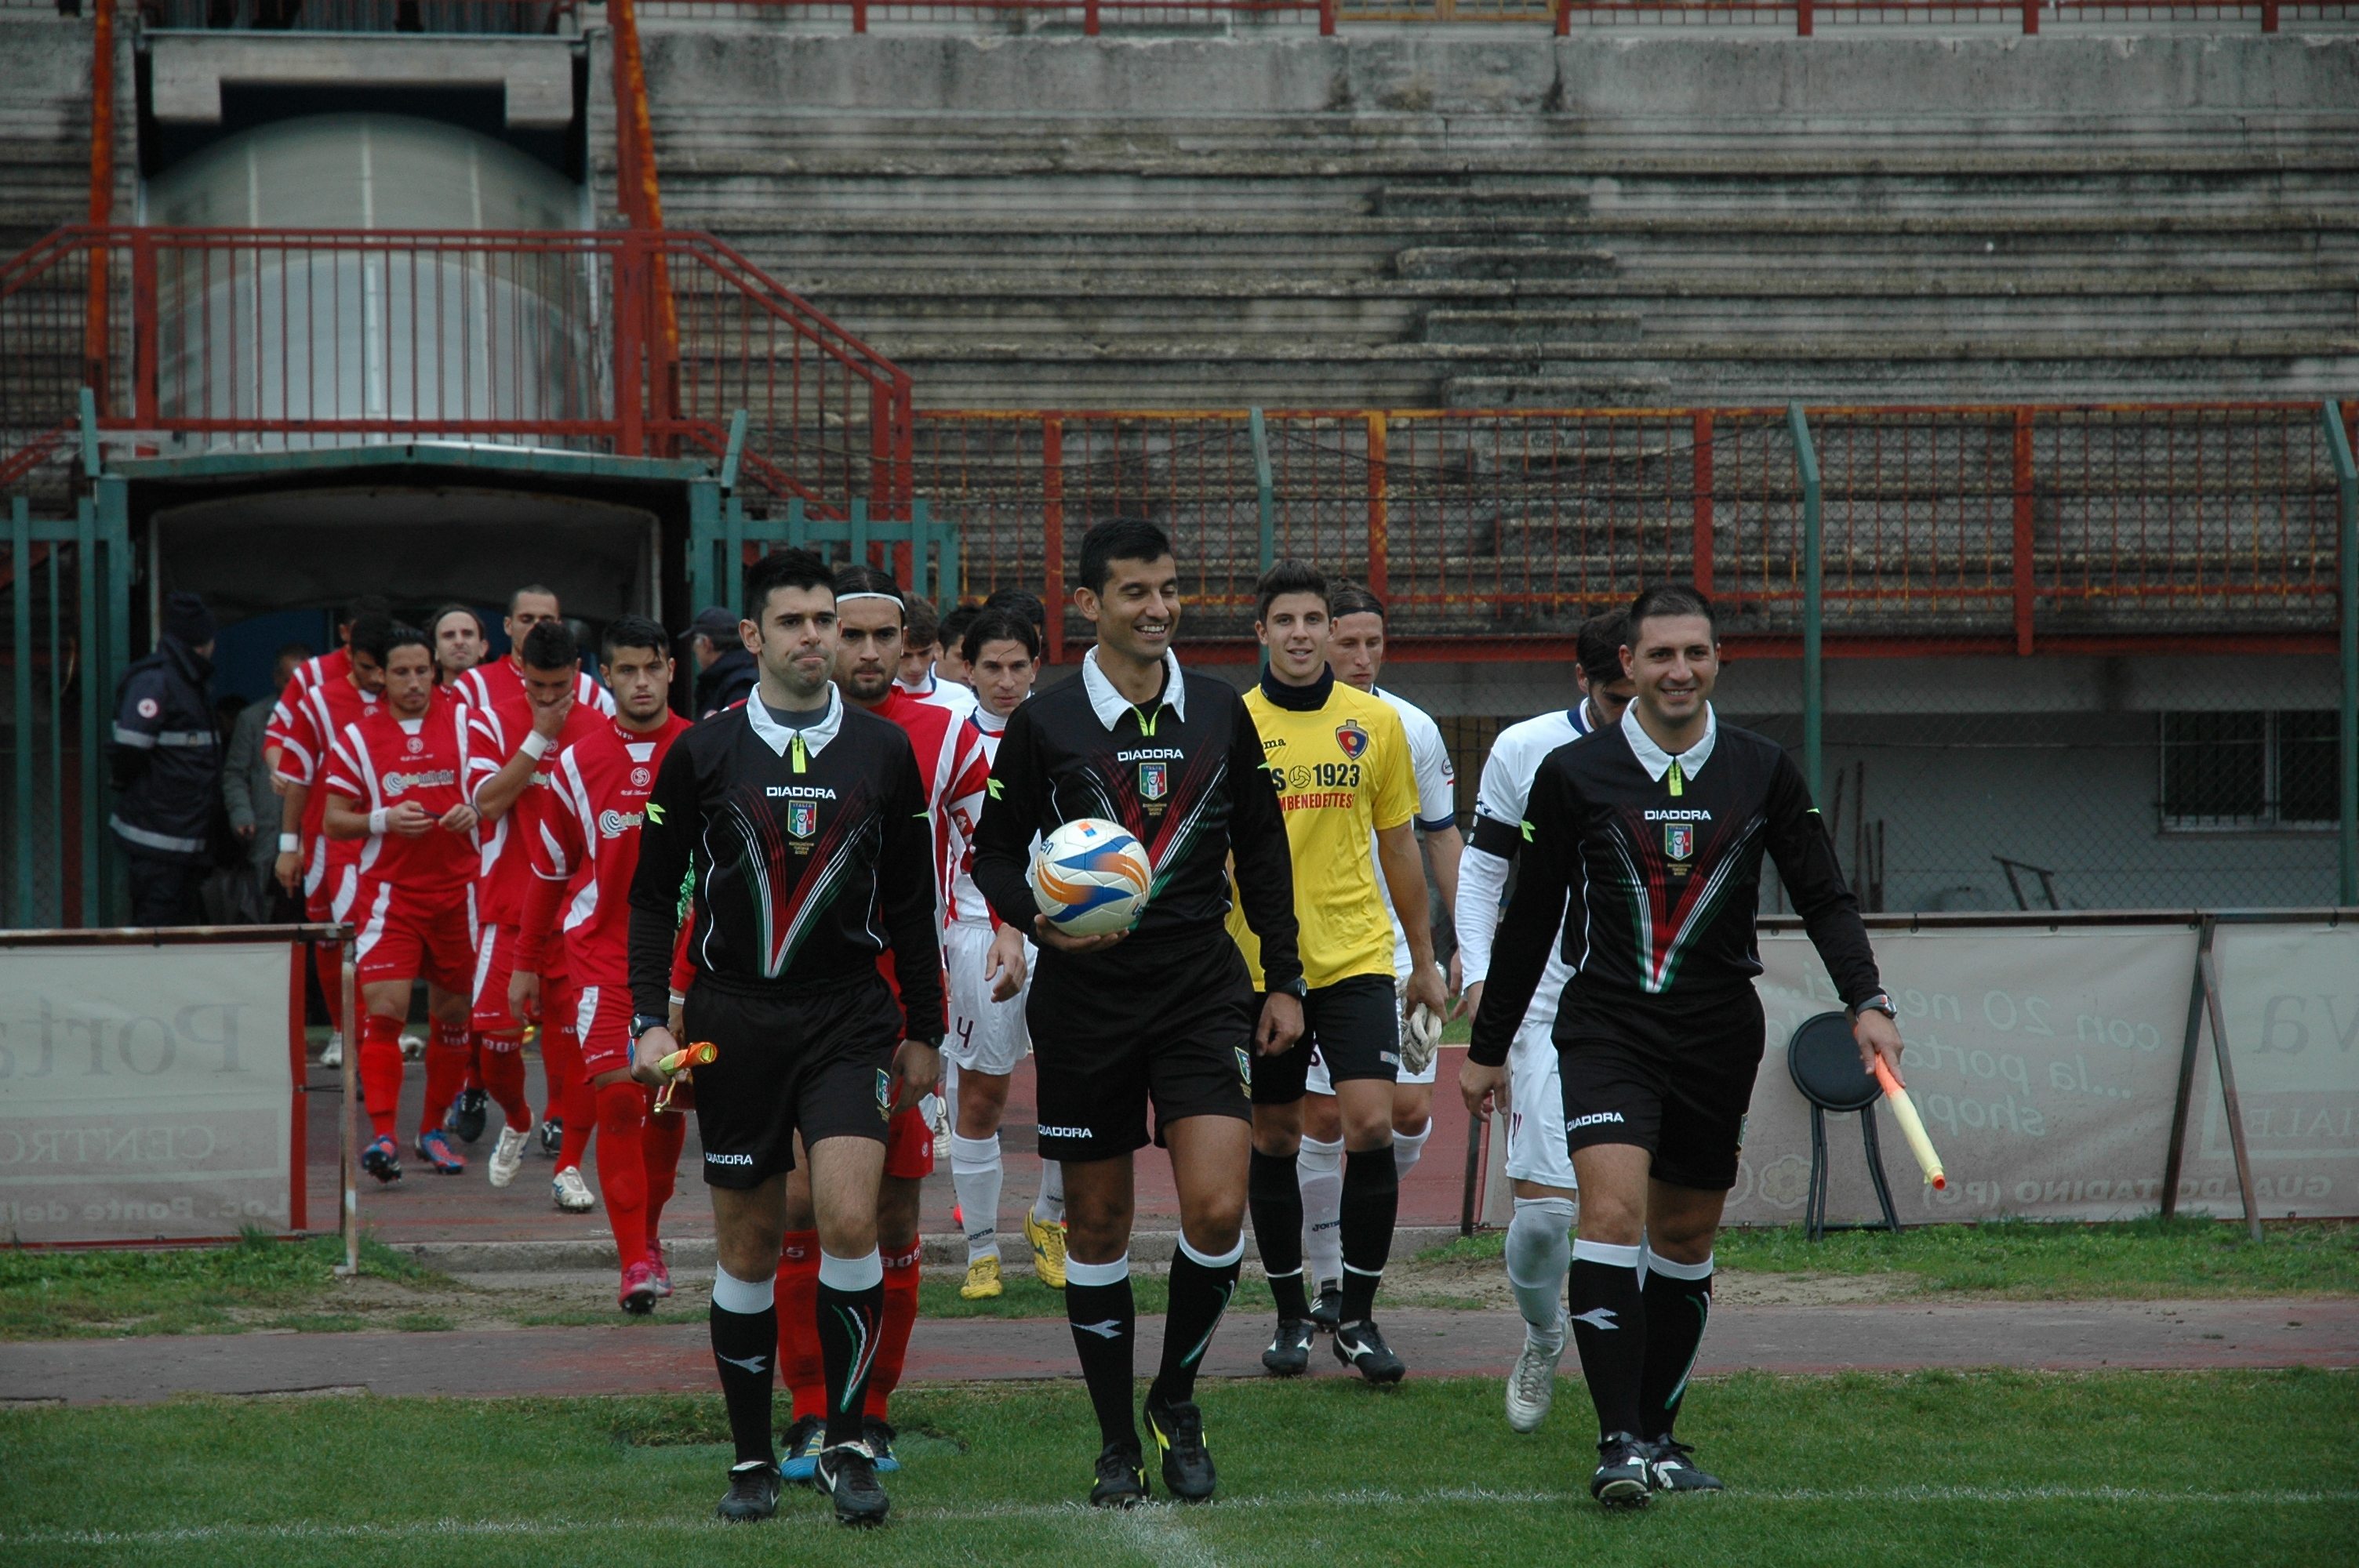 Samb-Ancona, ingresso in campo (GIAMMUSSO)